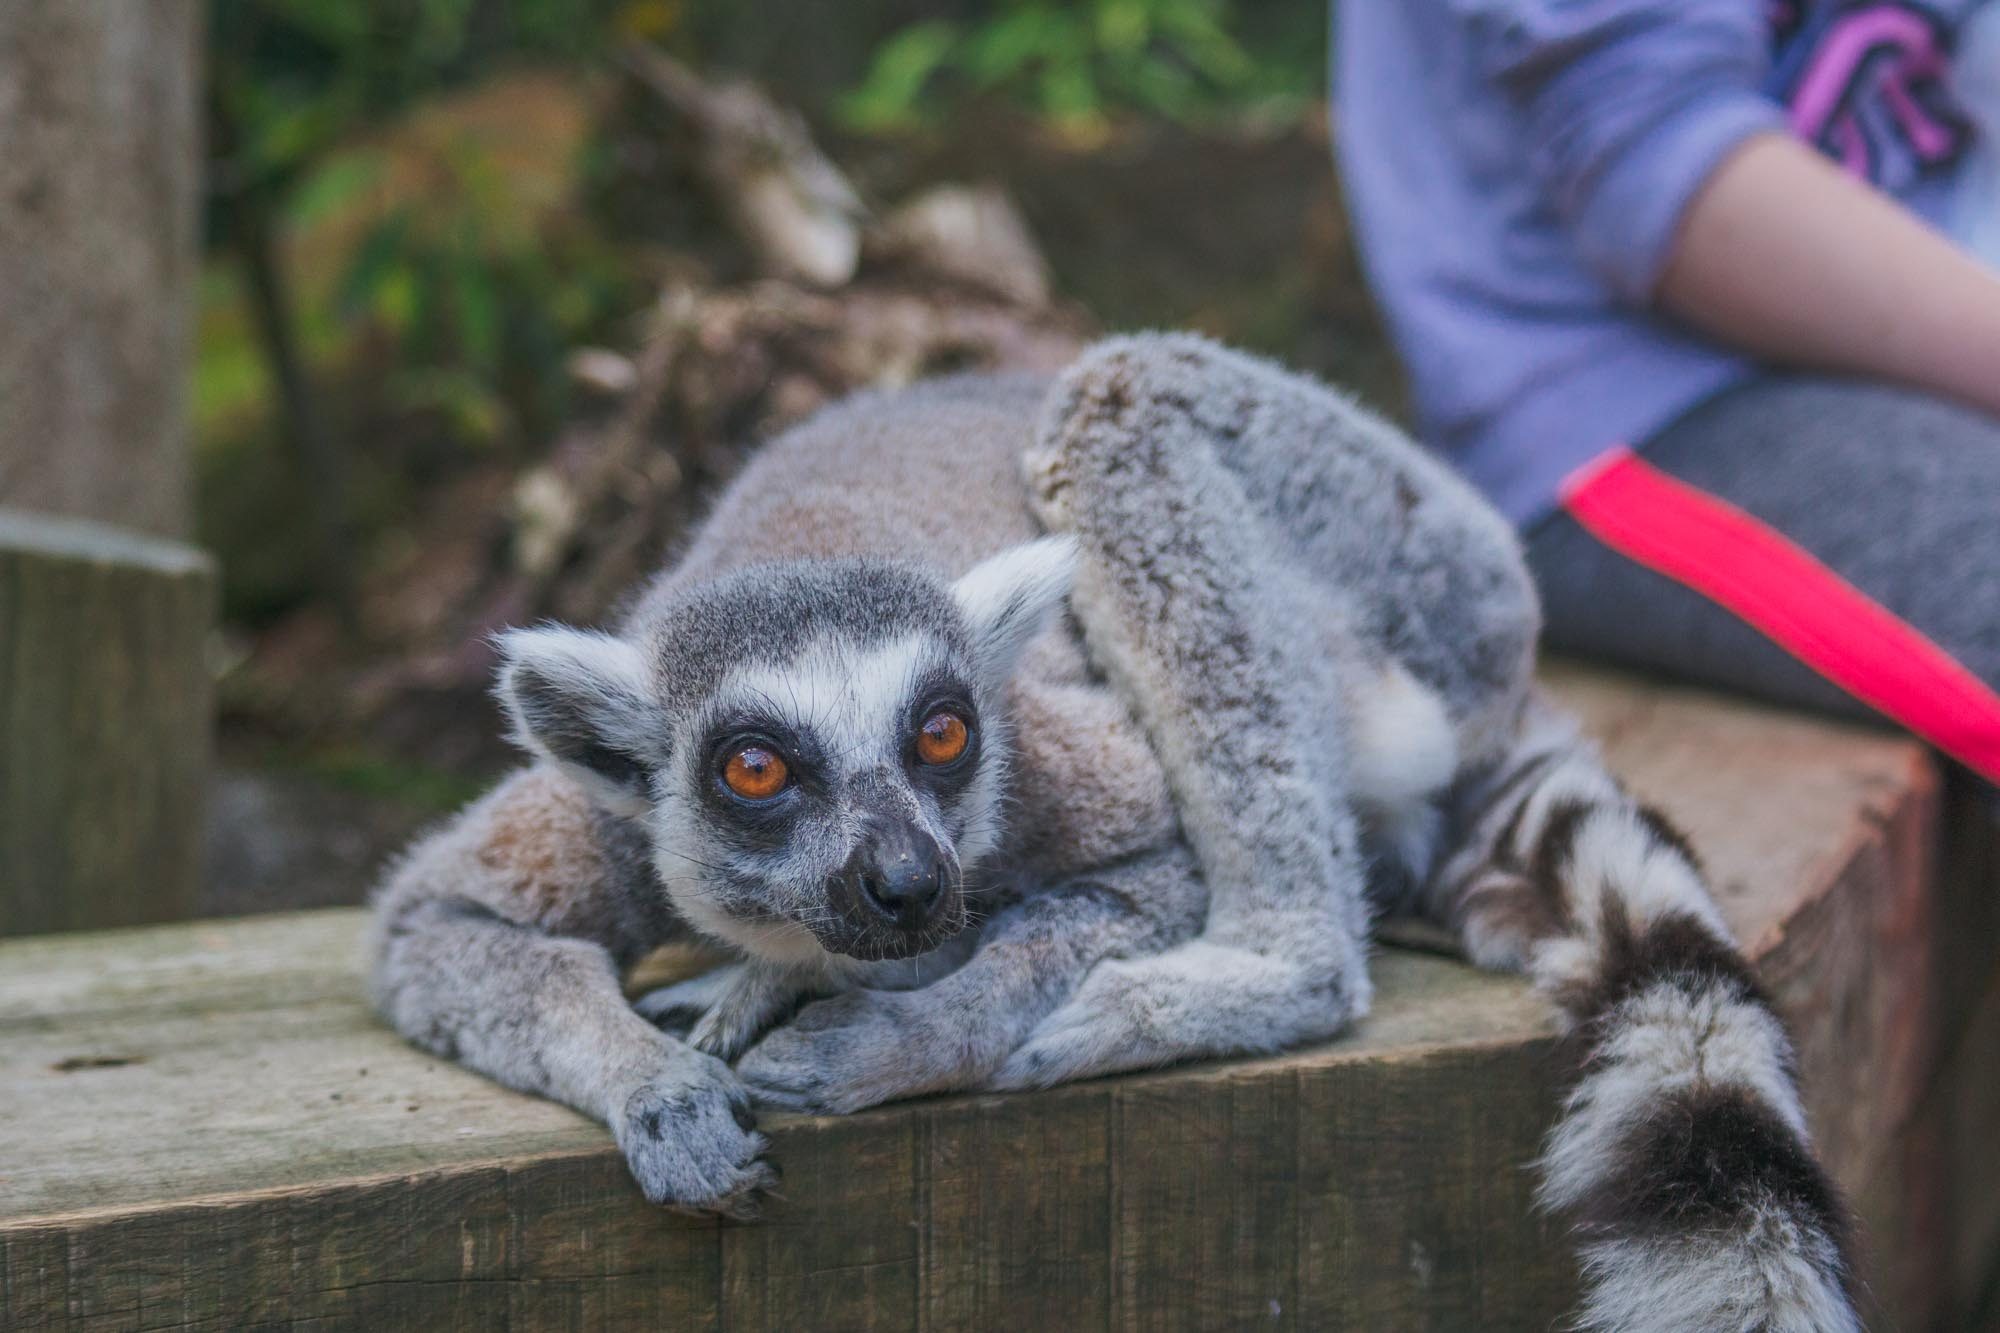 London Zoo ZSL - Lemurs